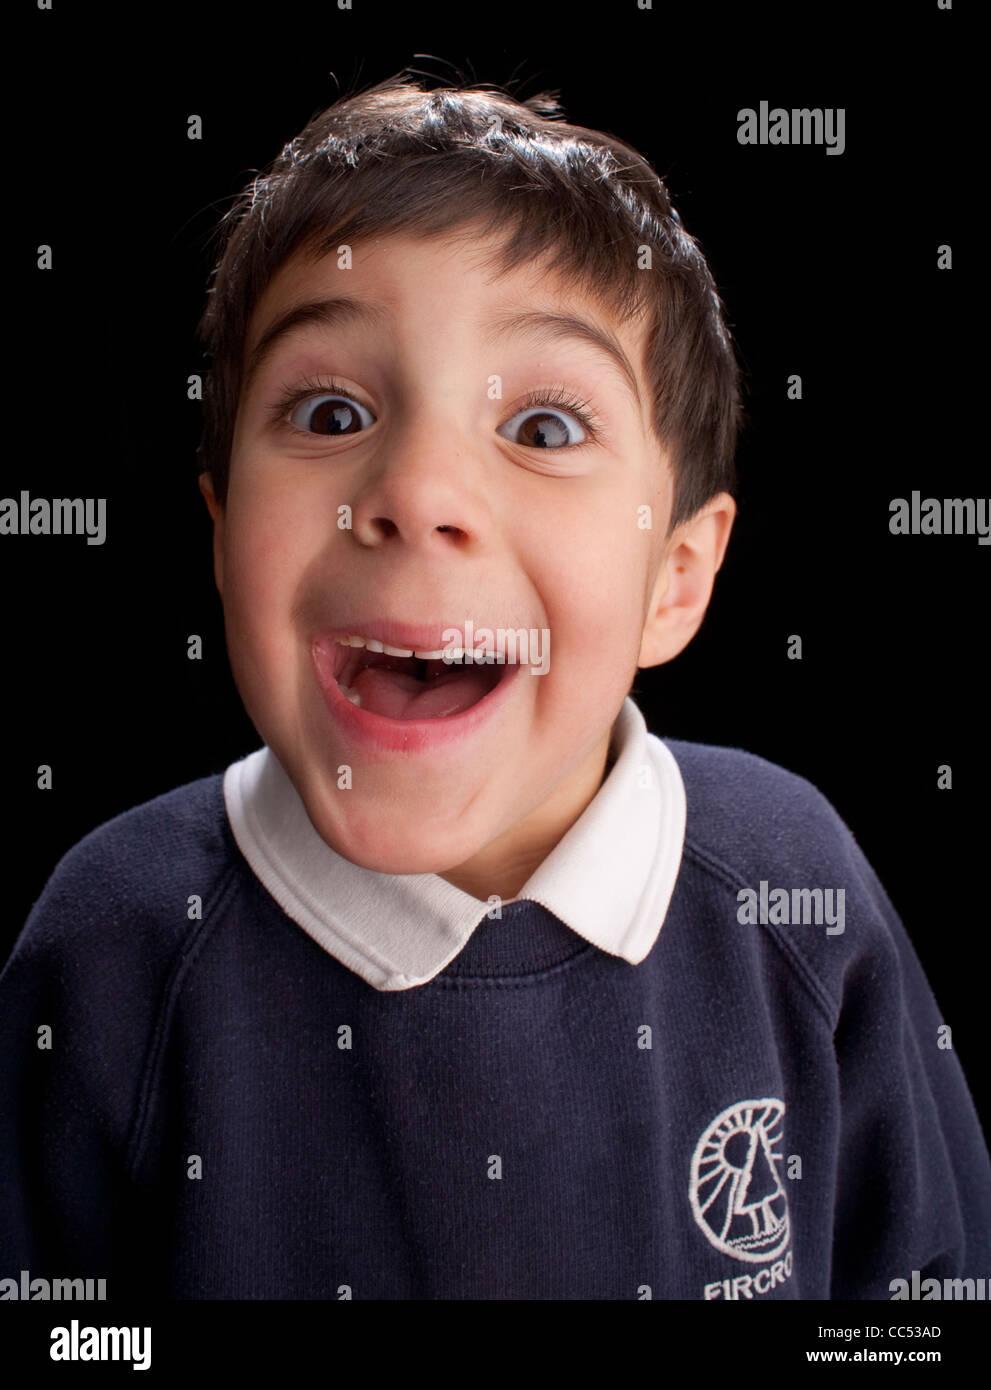 Boy smiling, studio shot Photo Stock